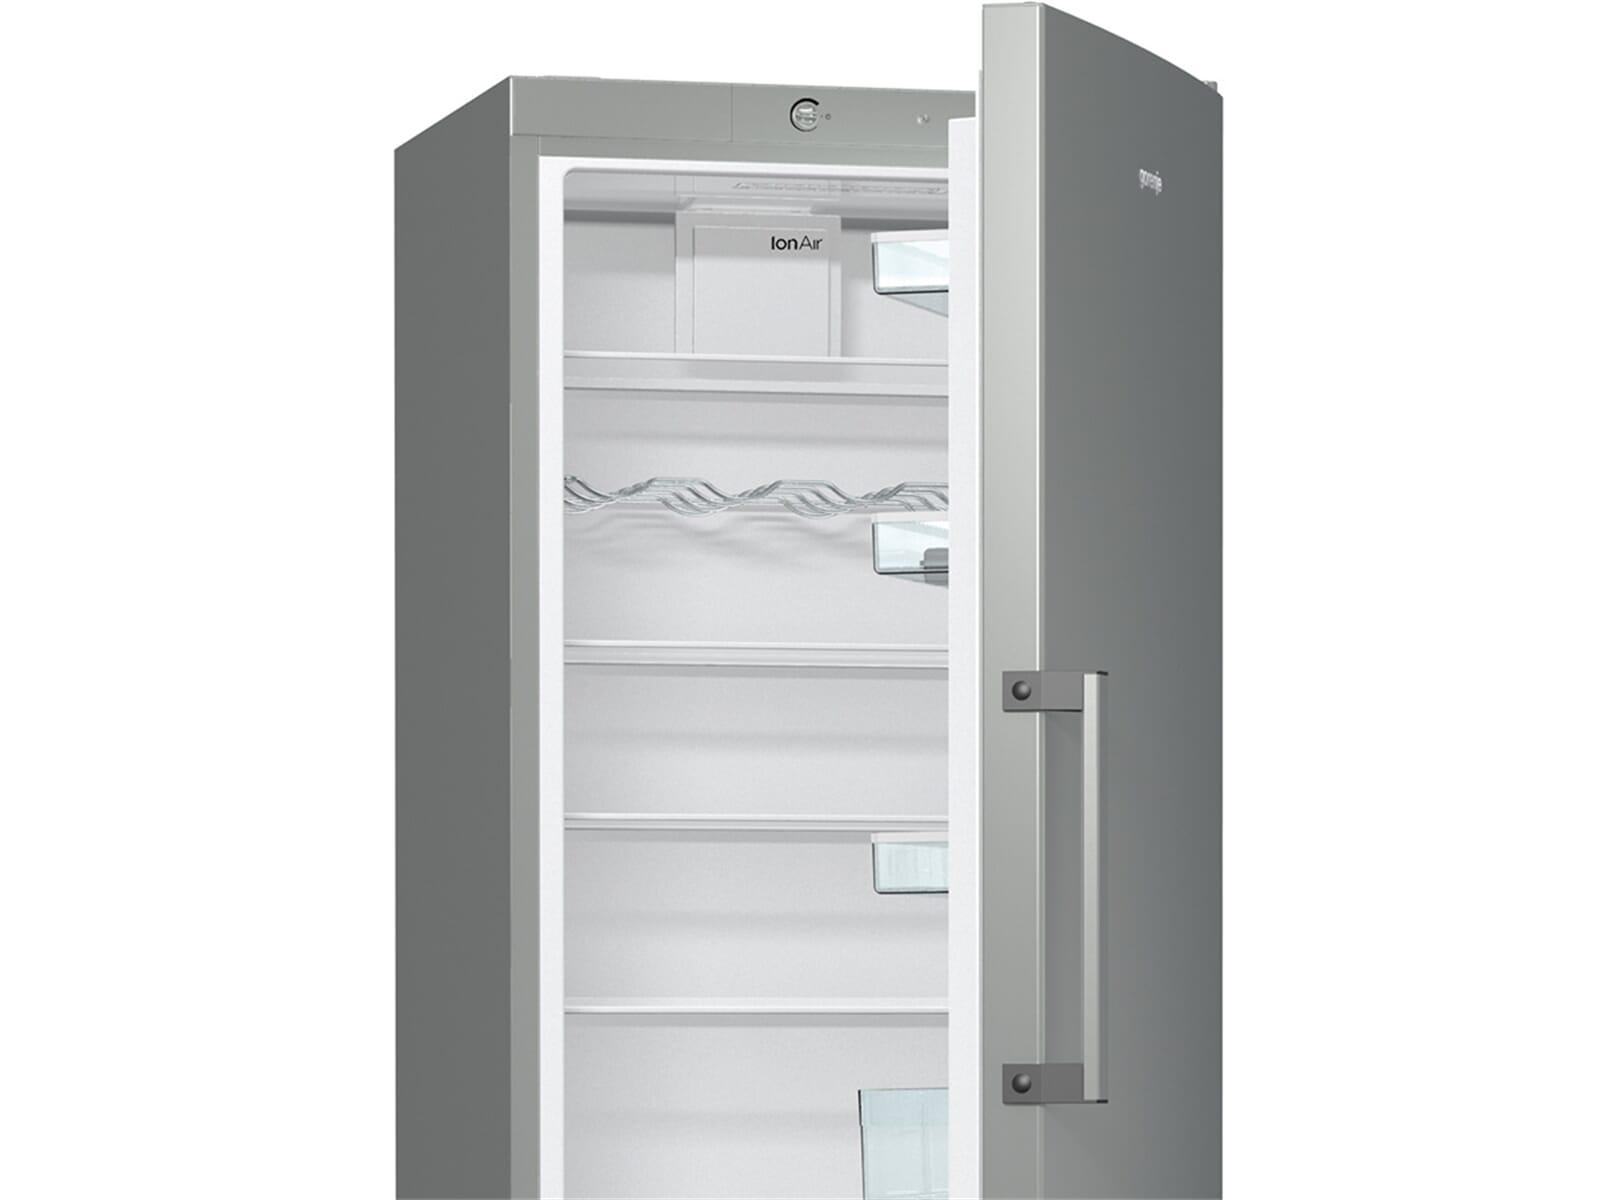 Gorenje Kühlschrank Ion Air : Gorenje r fx standkühlschrank inox